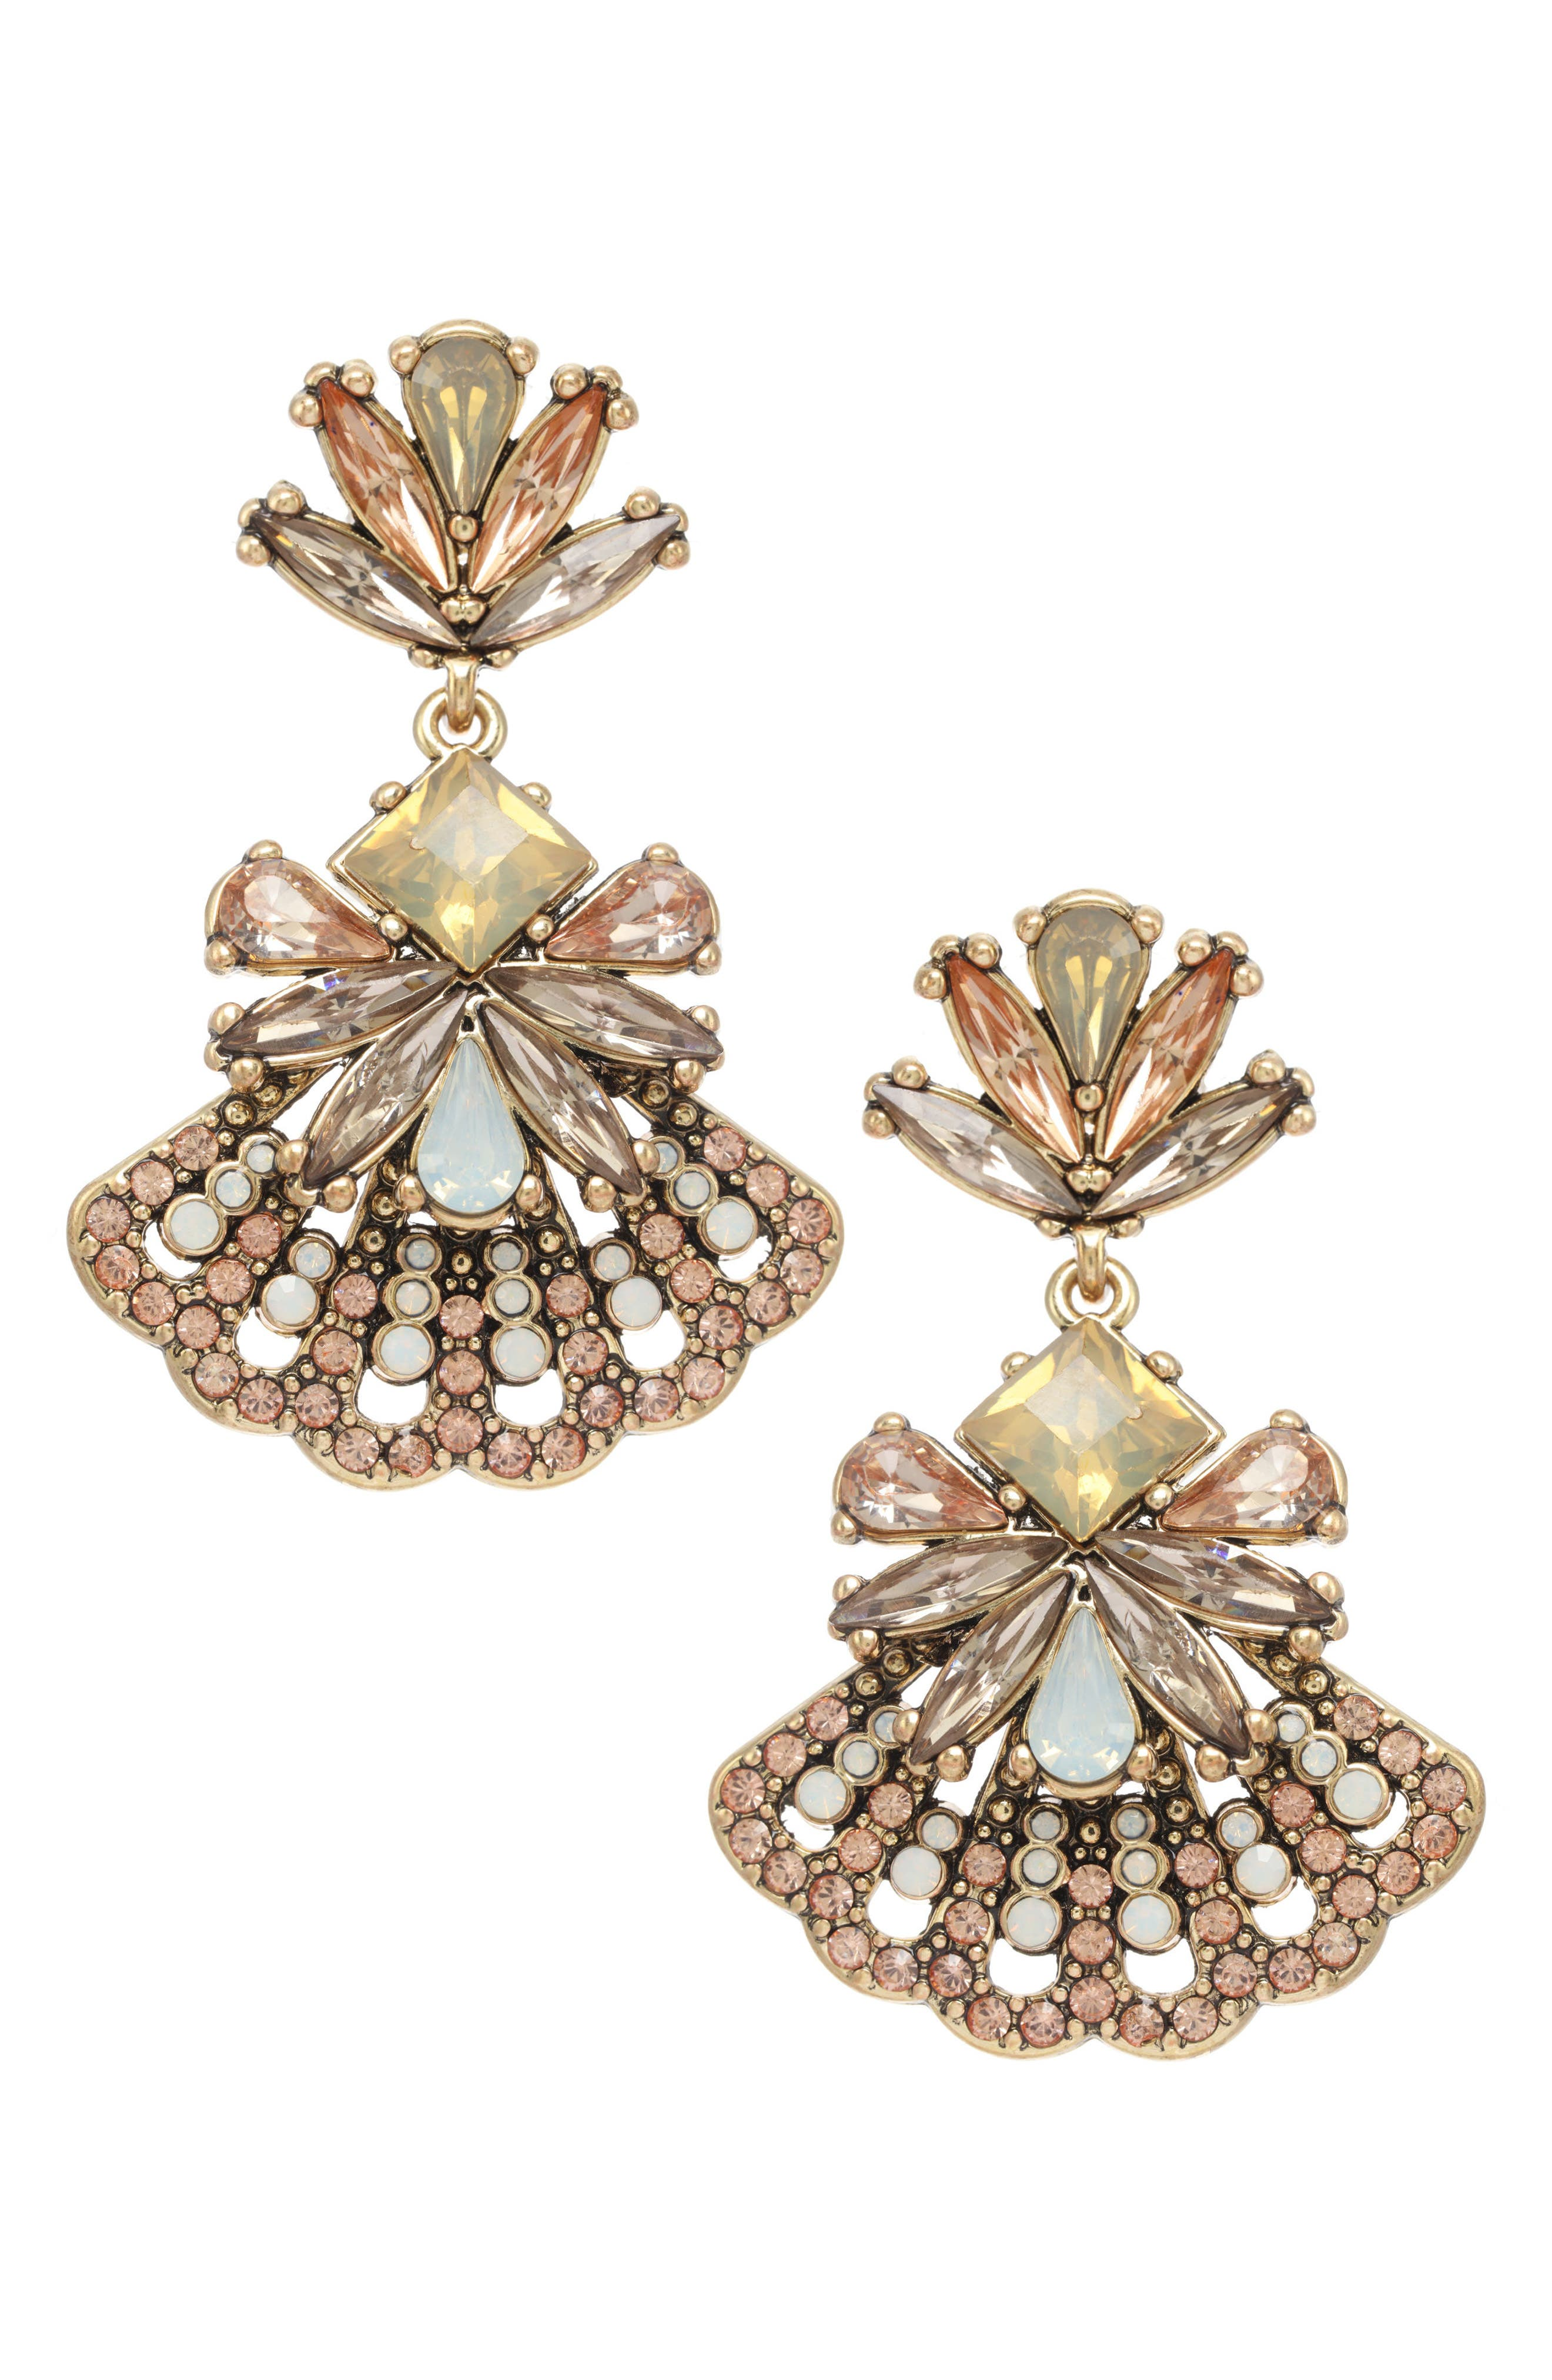 Crystal Fan Earrings,                         Main,                         color, Antique Gold/ Peach